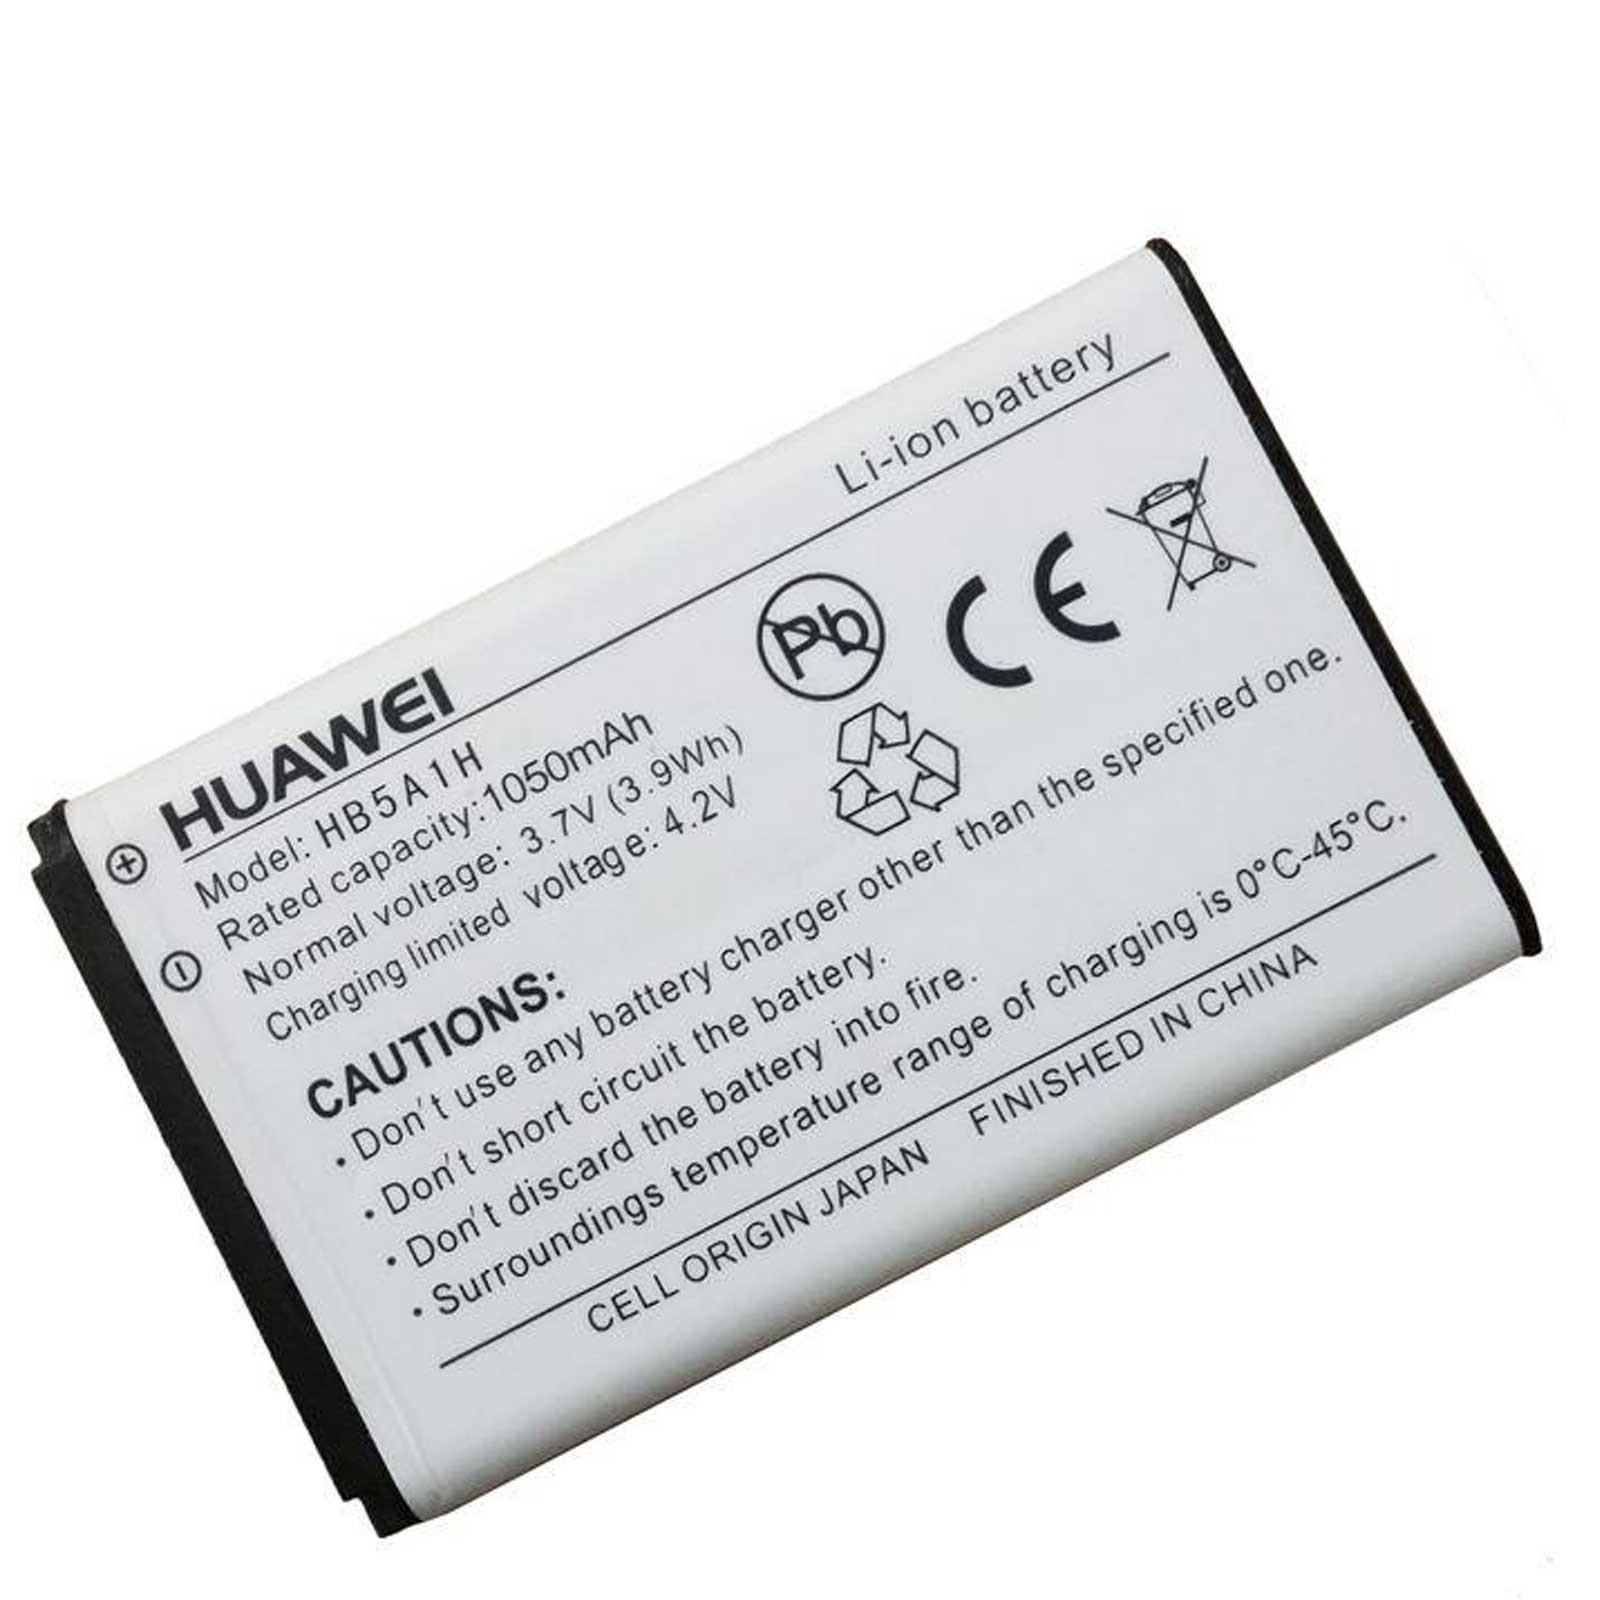 Huawei HB5A1H Batteri – 3.7V / 1050mAh